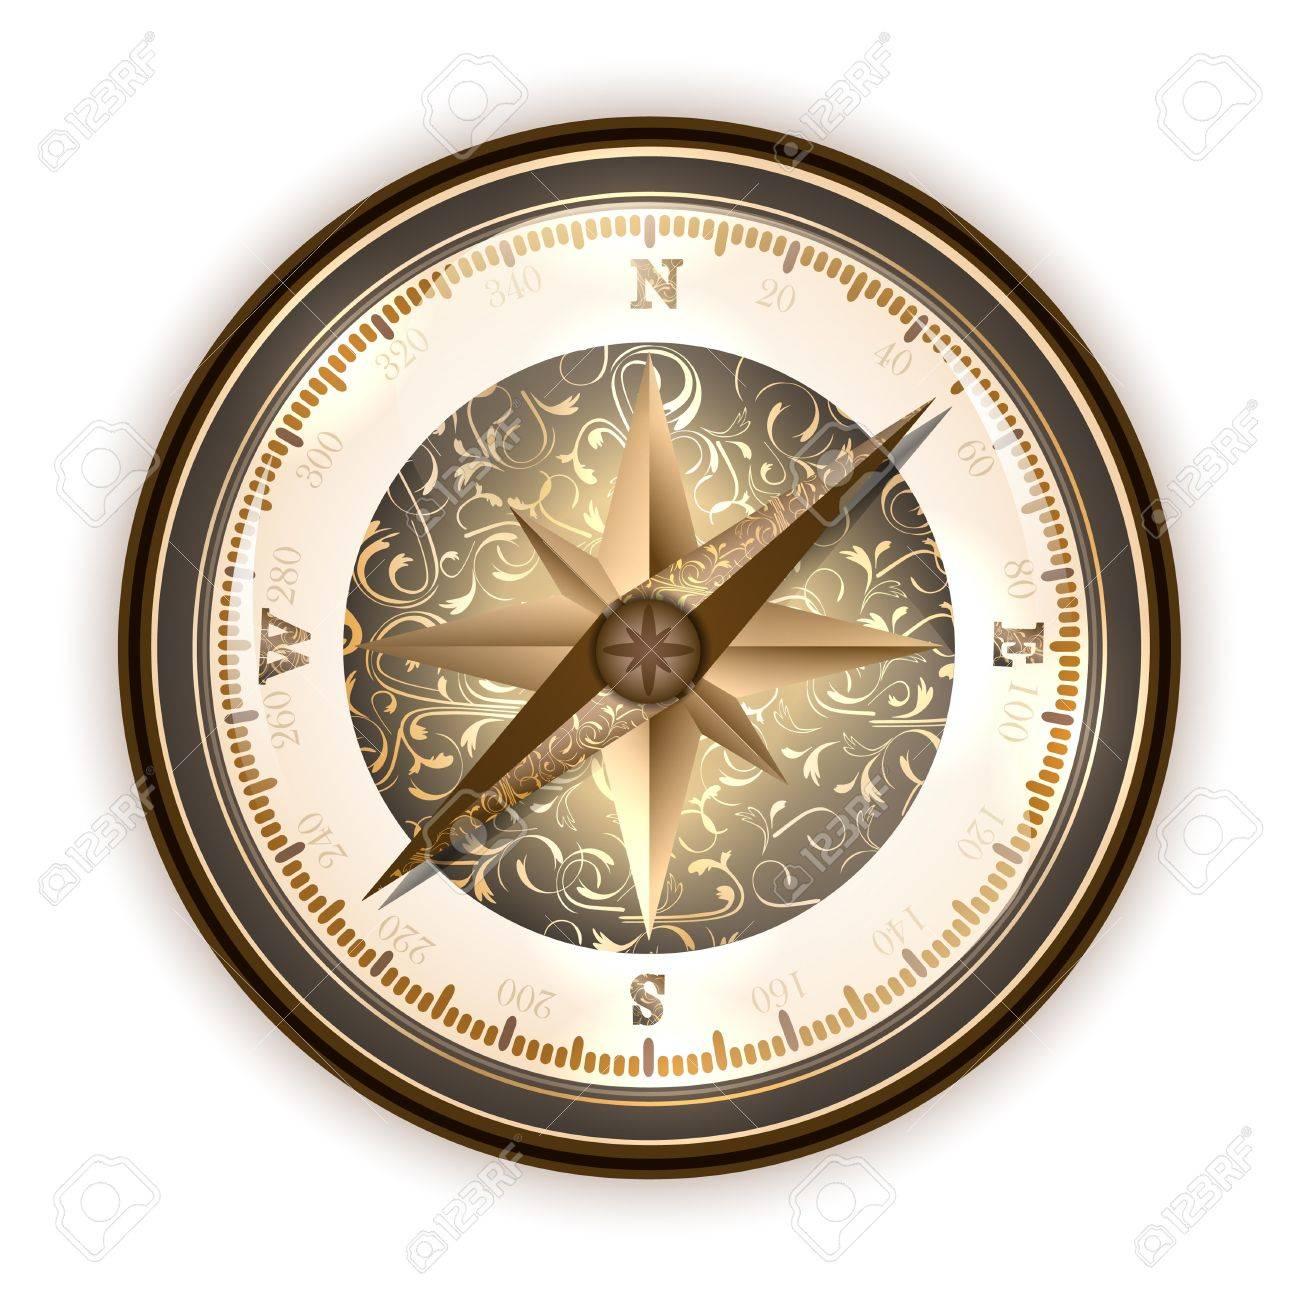 Vintage antique compass over white - 14008443